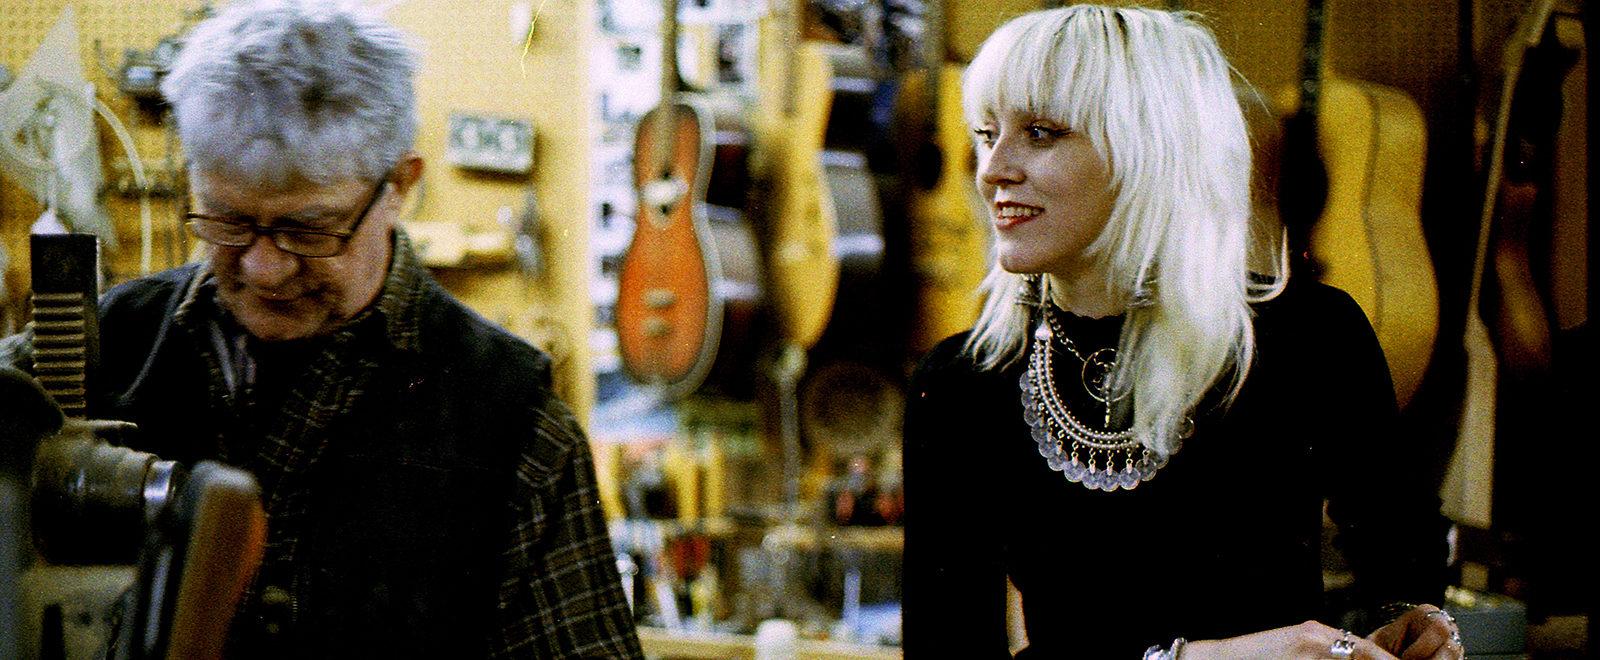 Cindy Hulej Guitars Carmine Street Guitars New York